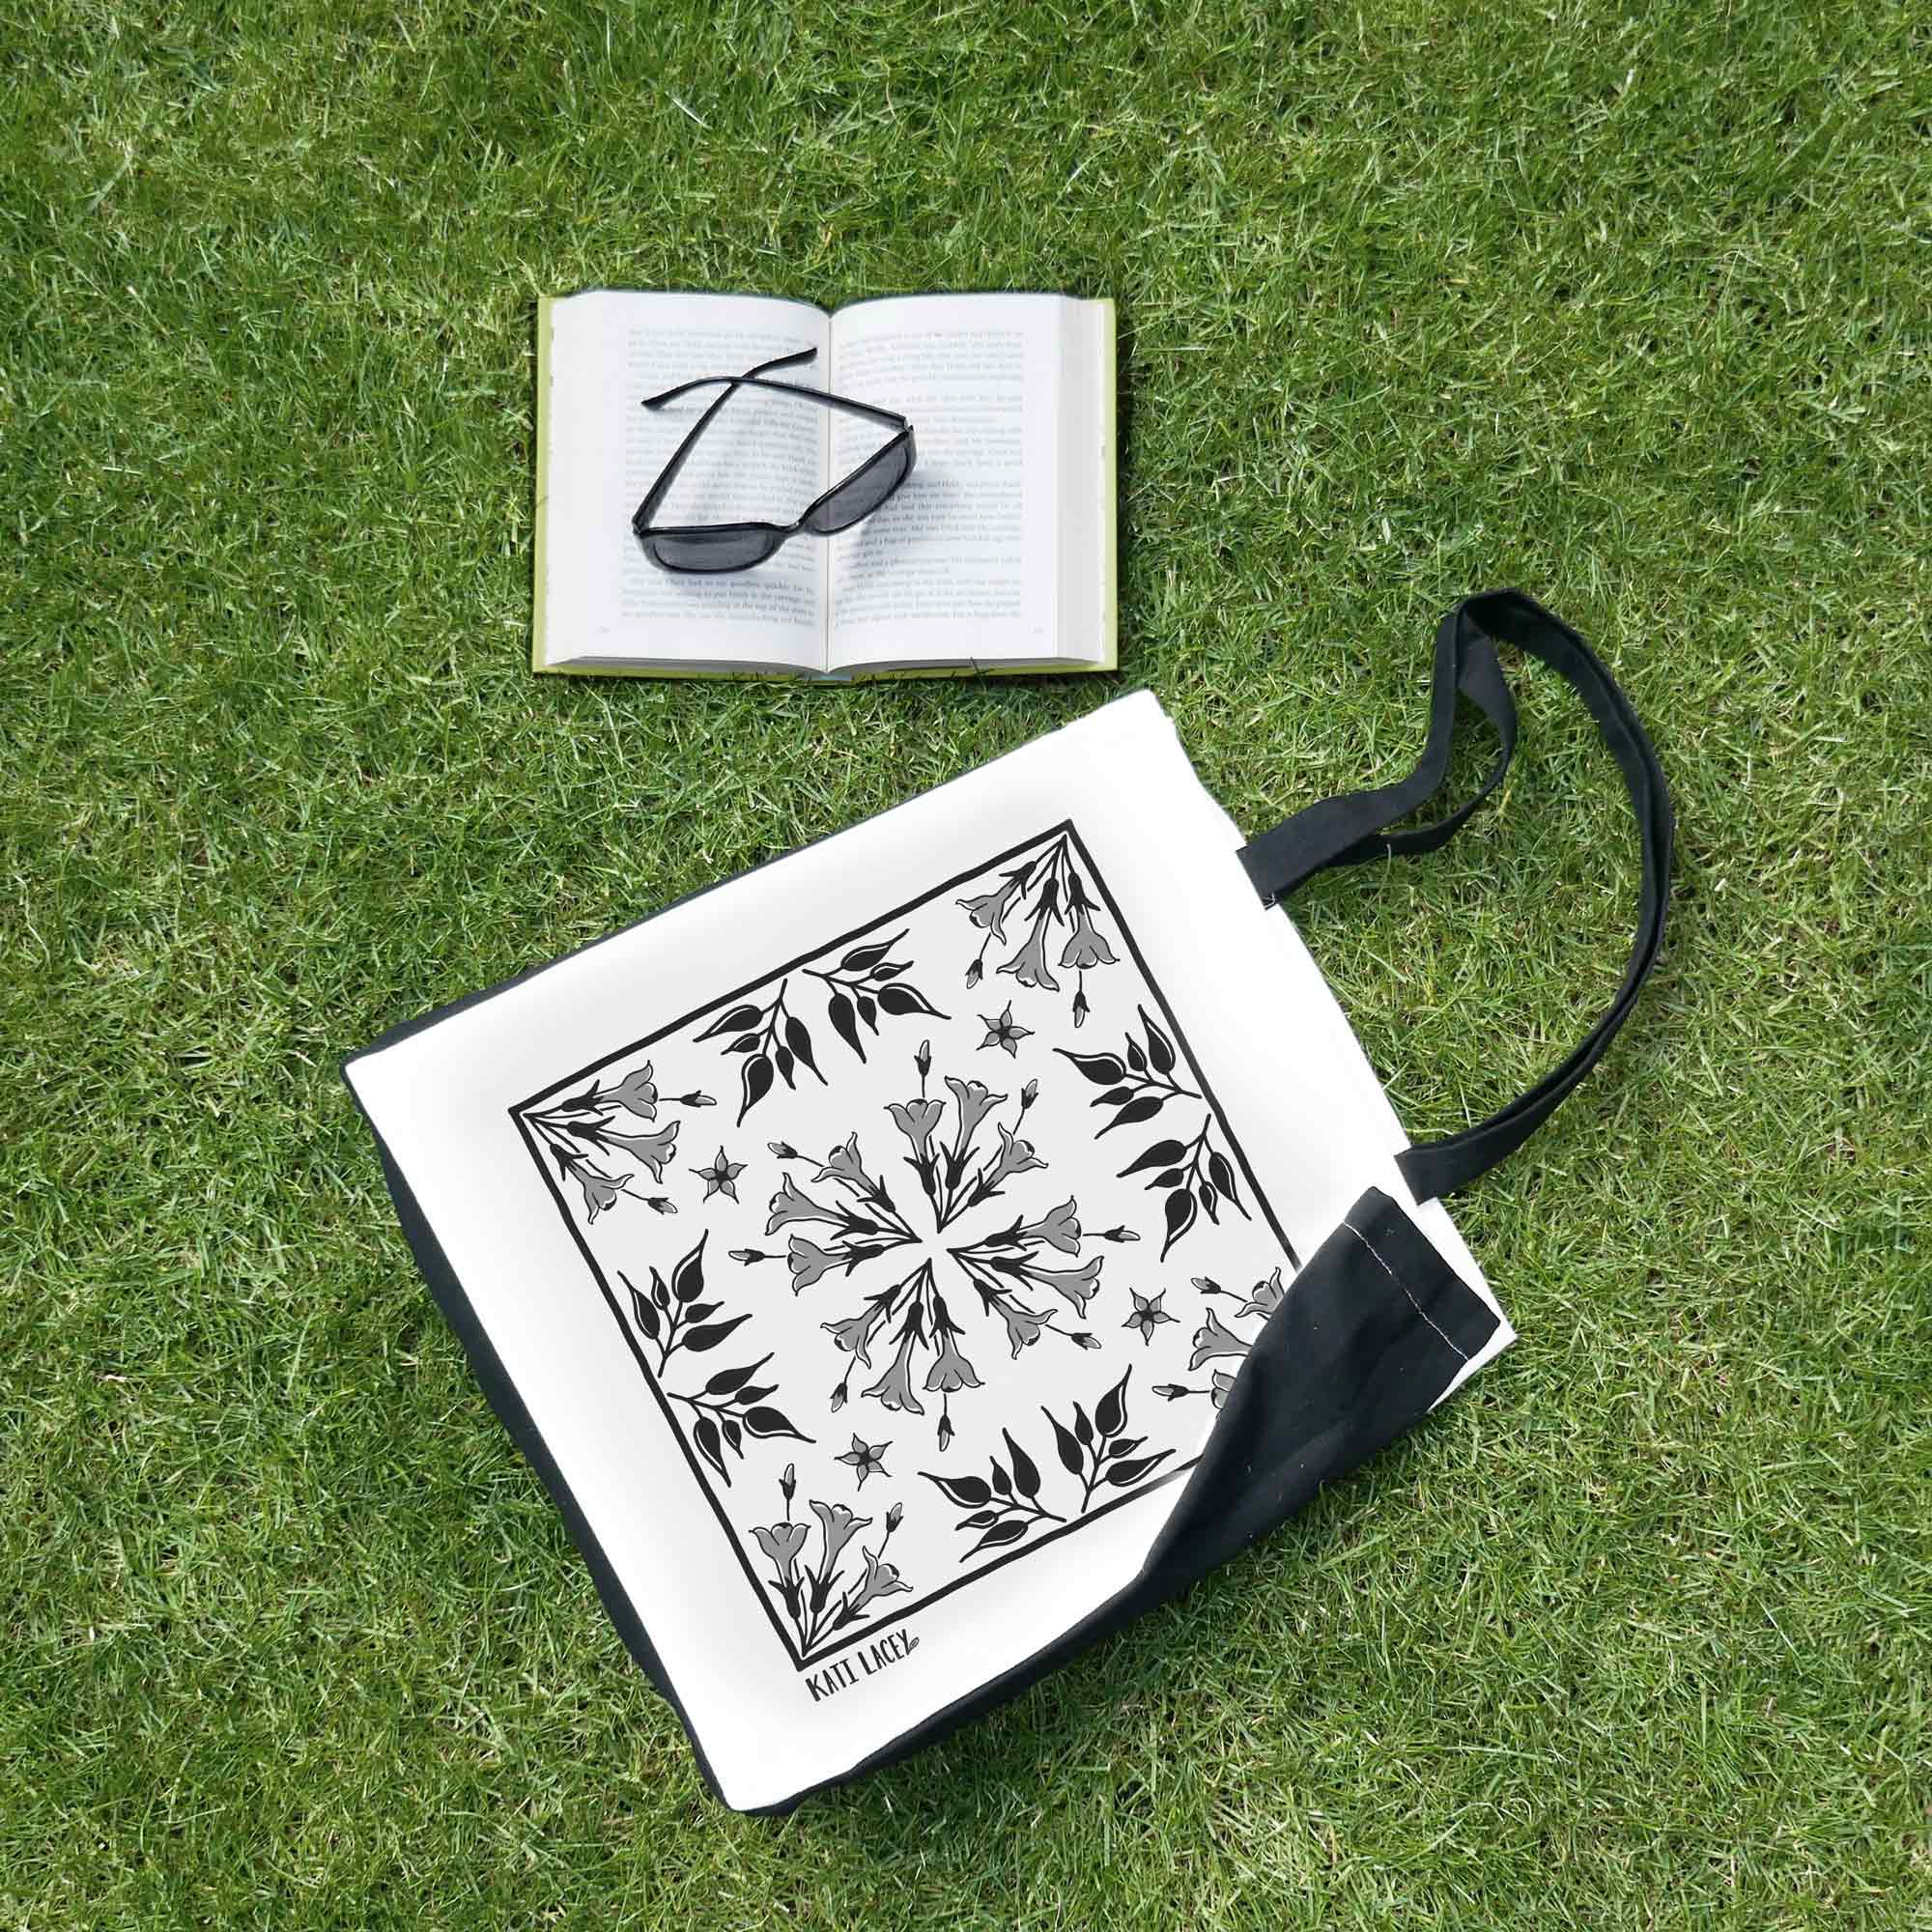 Iznik inspired black and white tile design on large two-tone shopper with Jasmine floral design